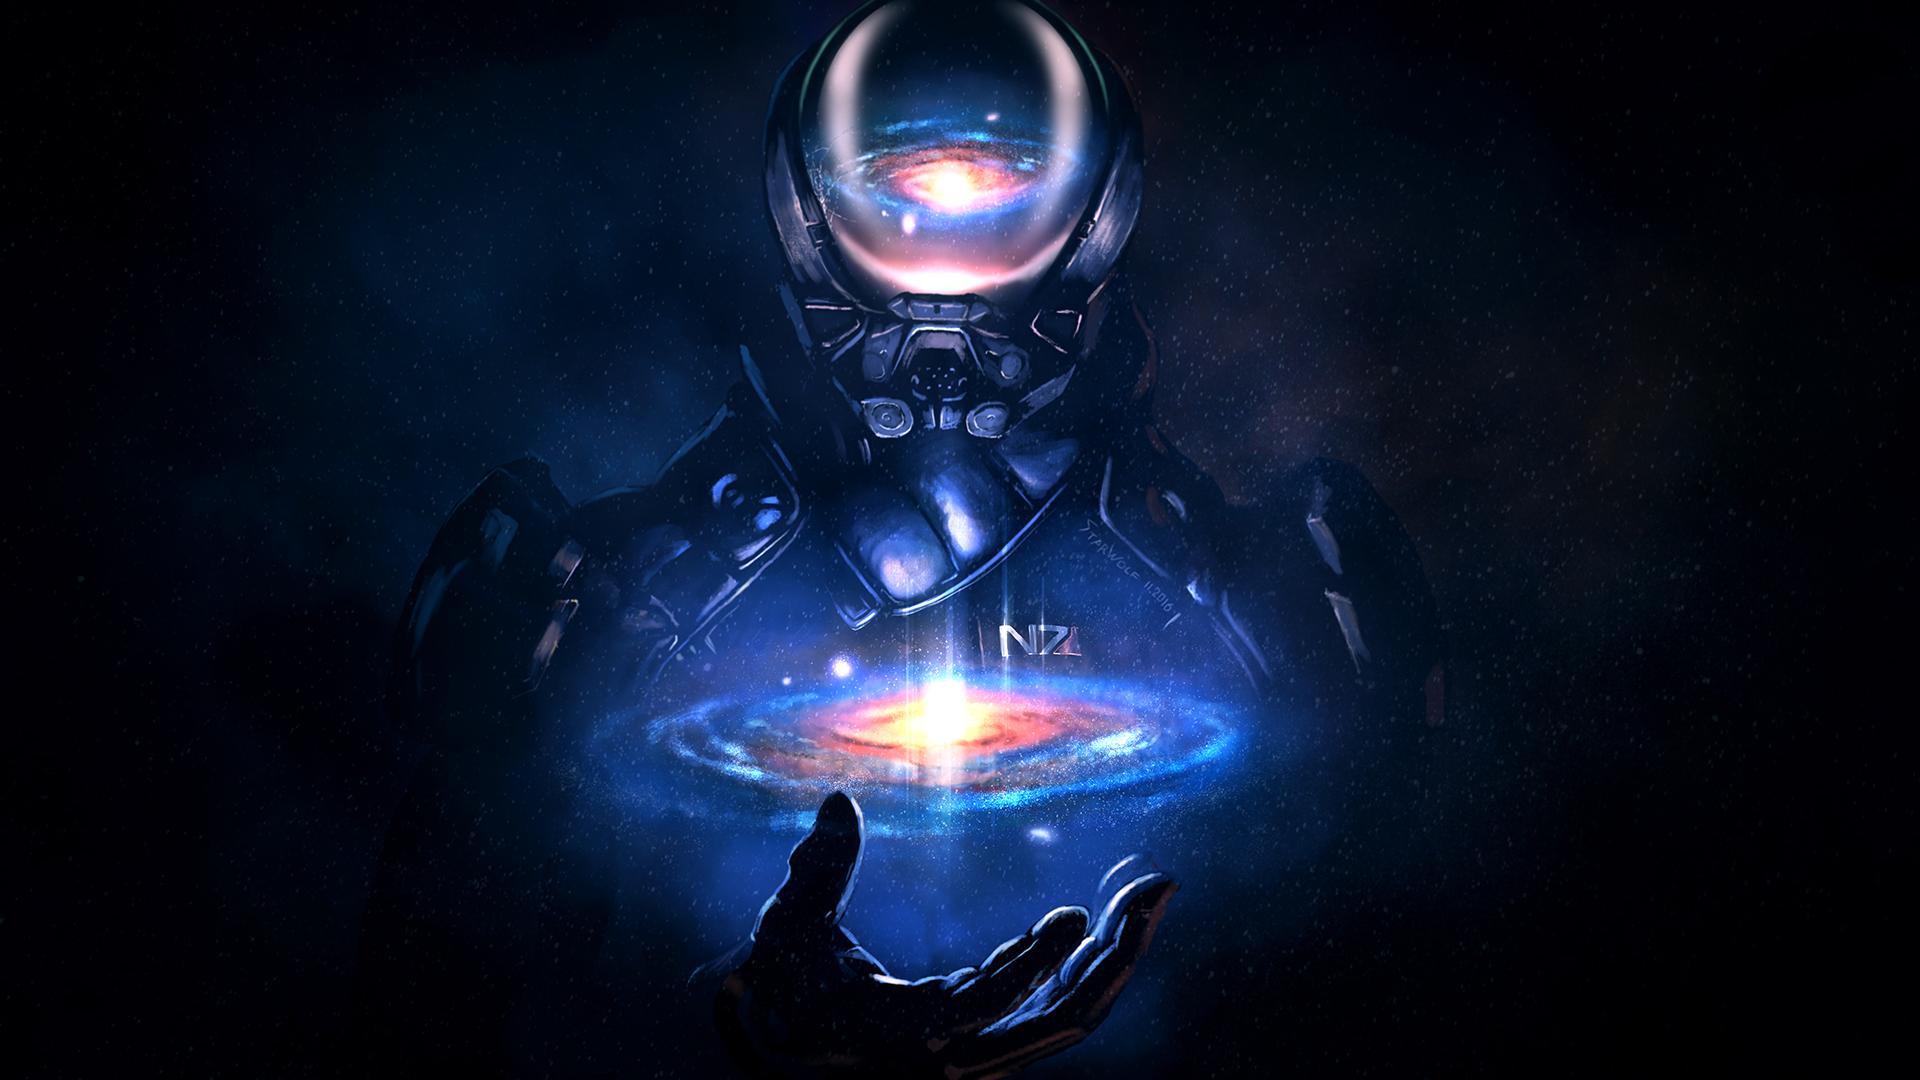 Mass Effect: Andromeda - Los galaktyki jest w twoich rękach Tapeta na pulpit Mass Effect: Andromeda